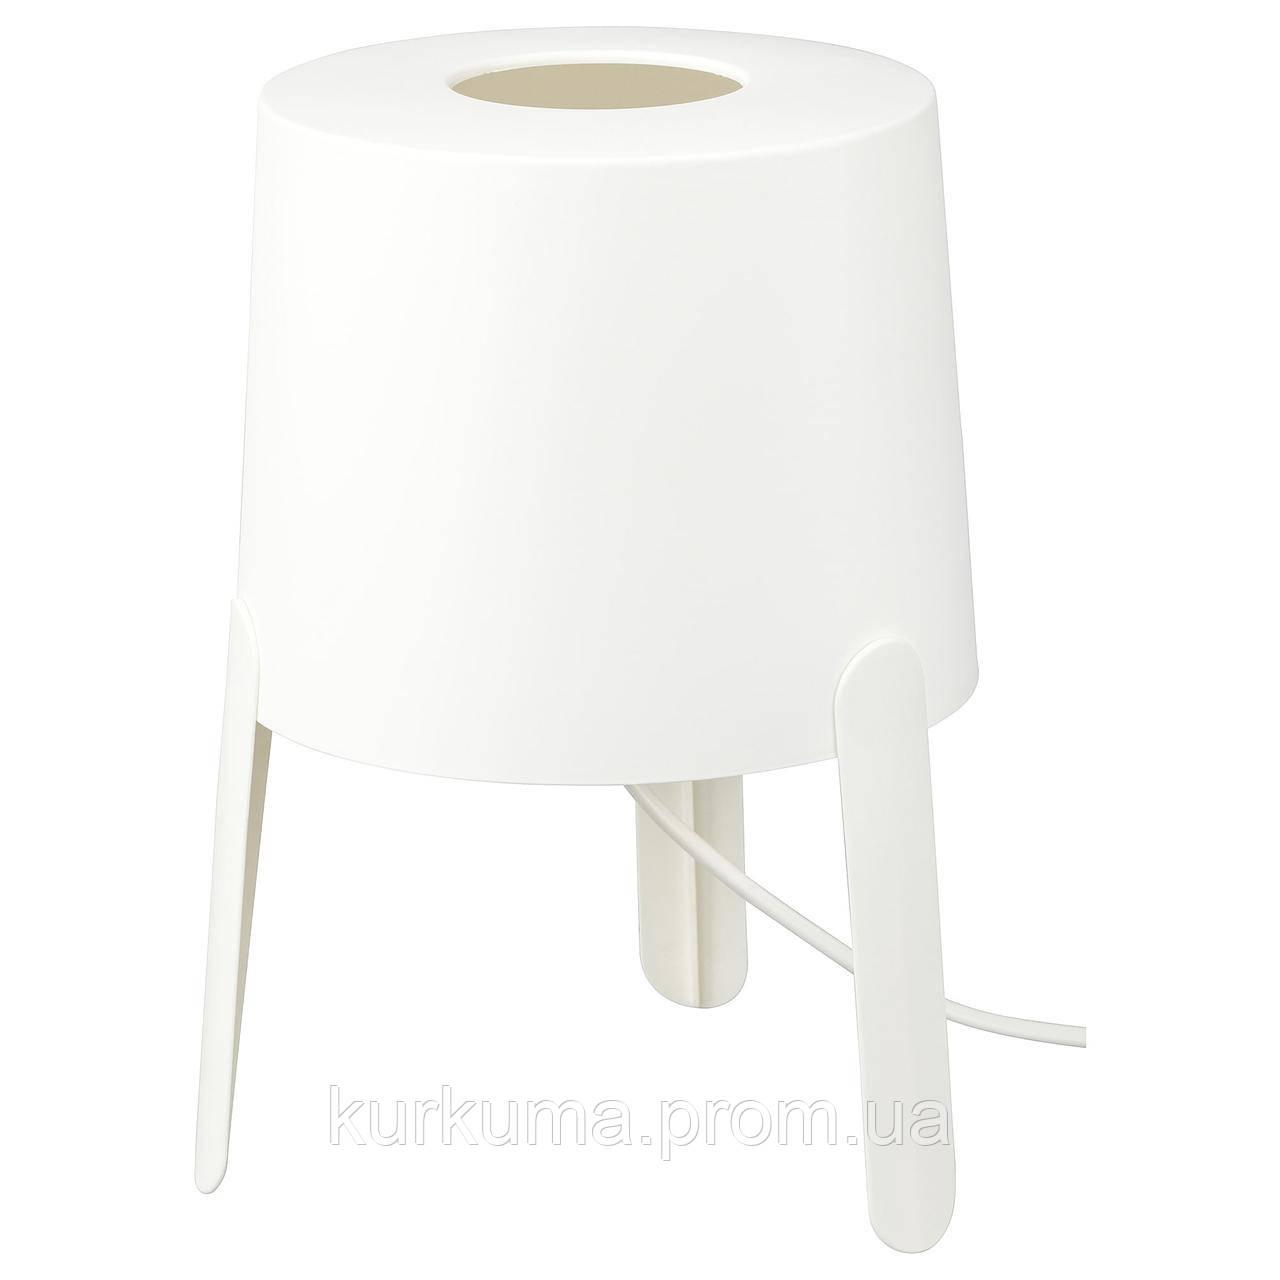 IKEA TVARS Наcтольная лампа, белый  (203.561.36)